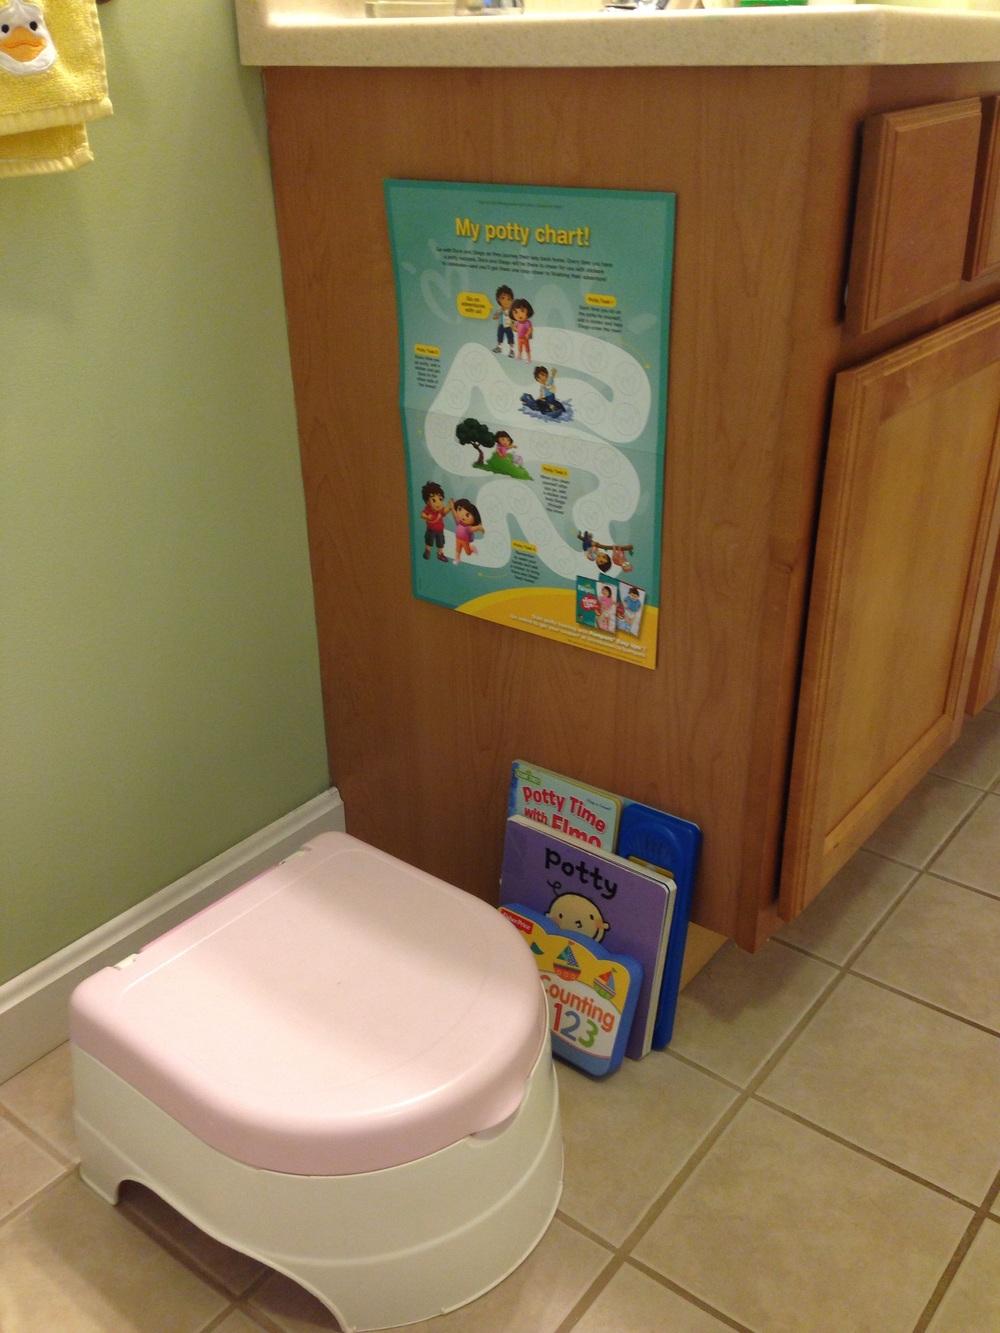 Great potty training setup:  potty, books, rewards chart.